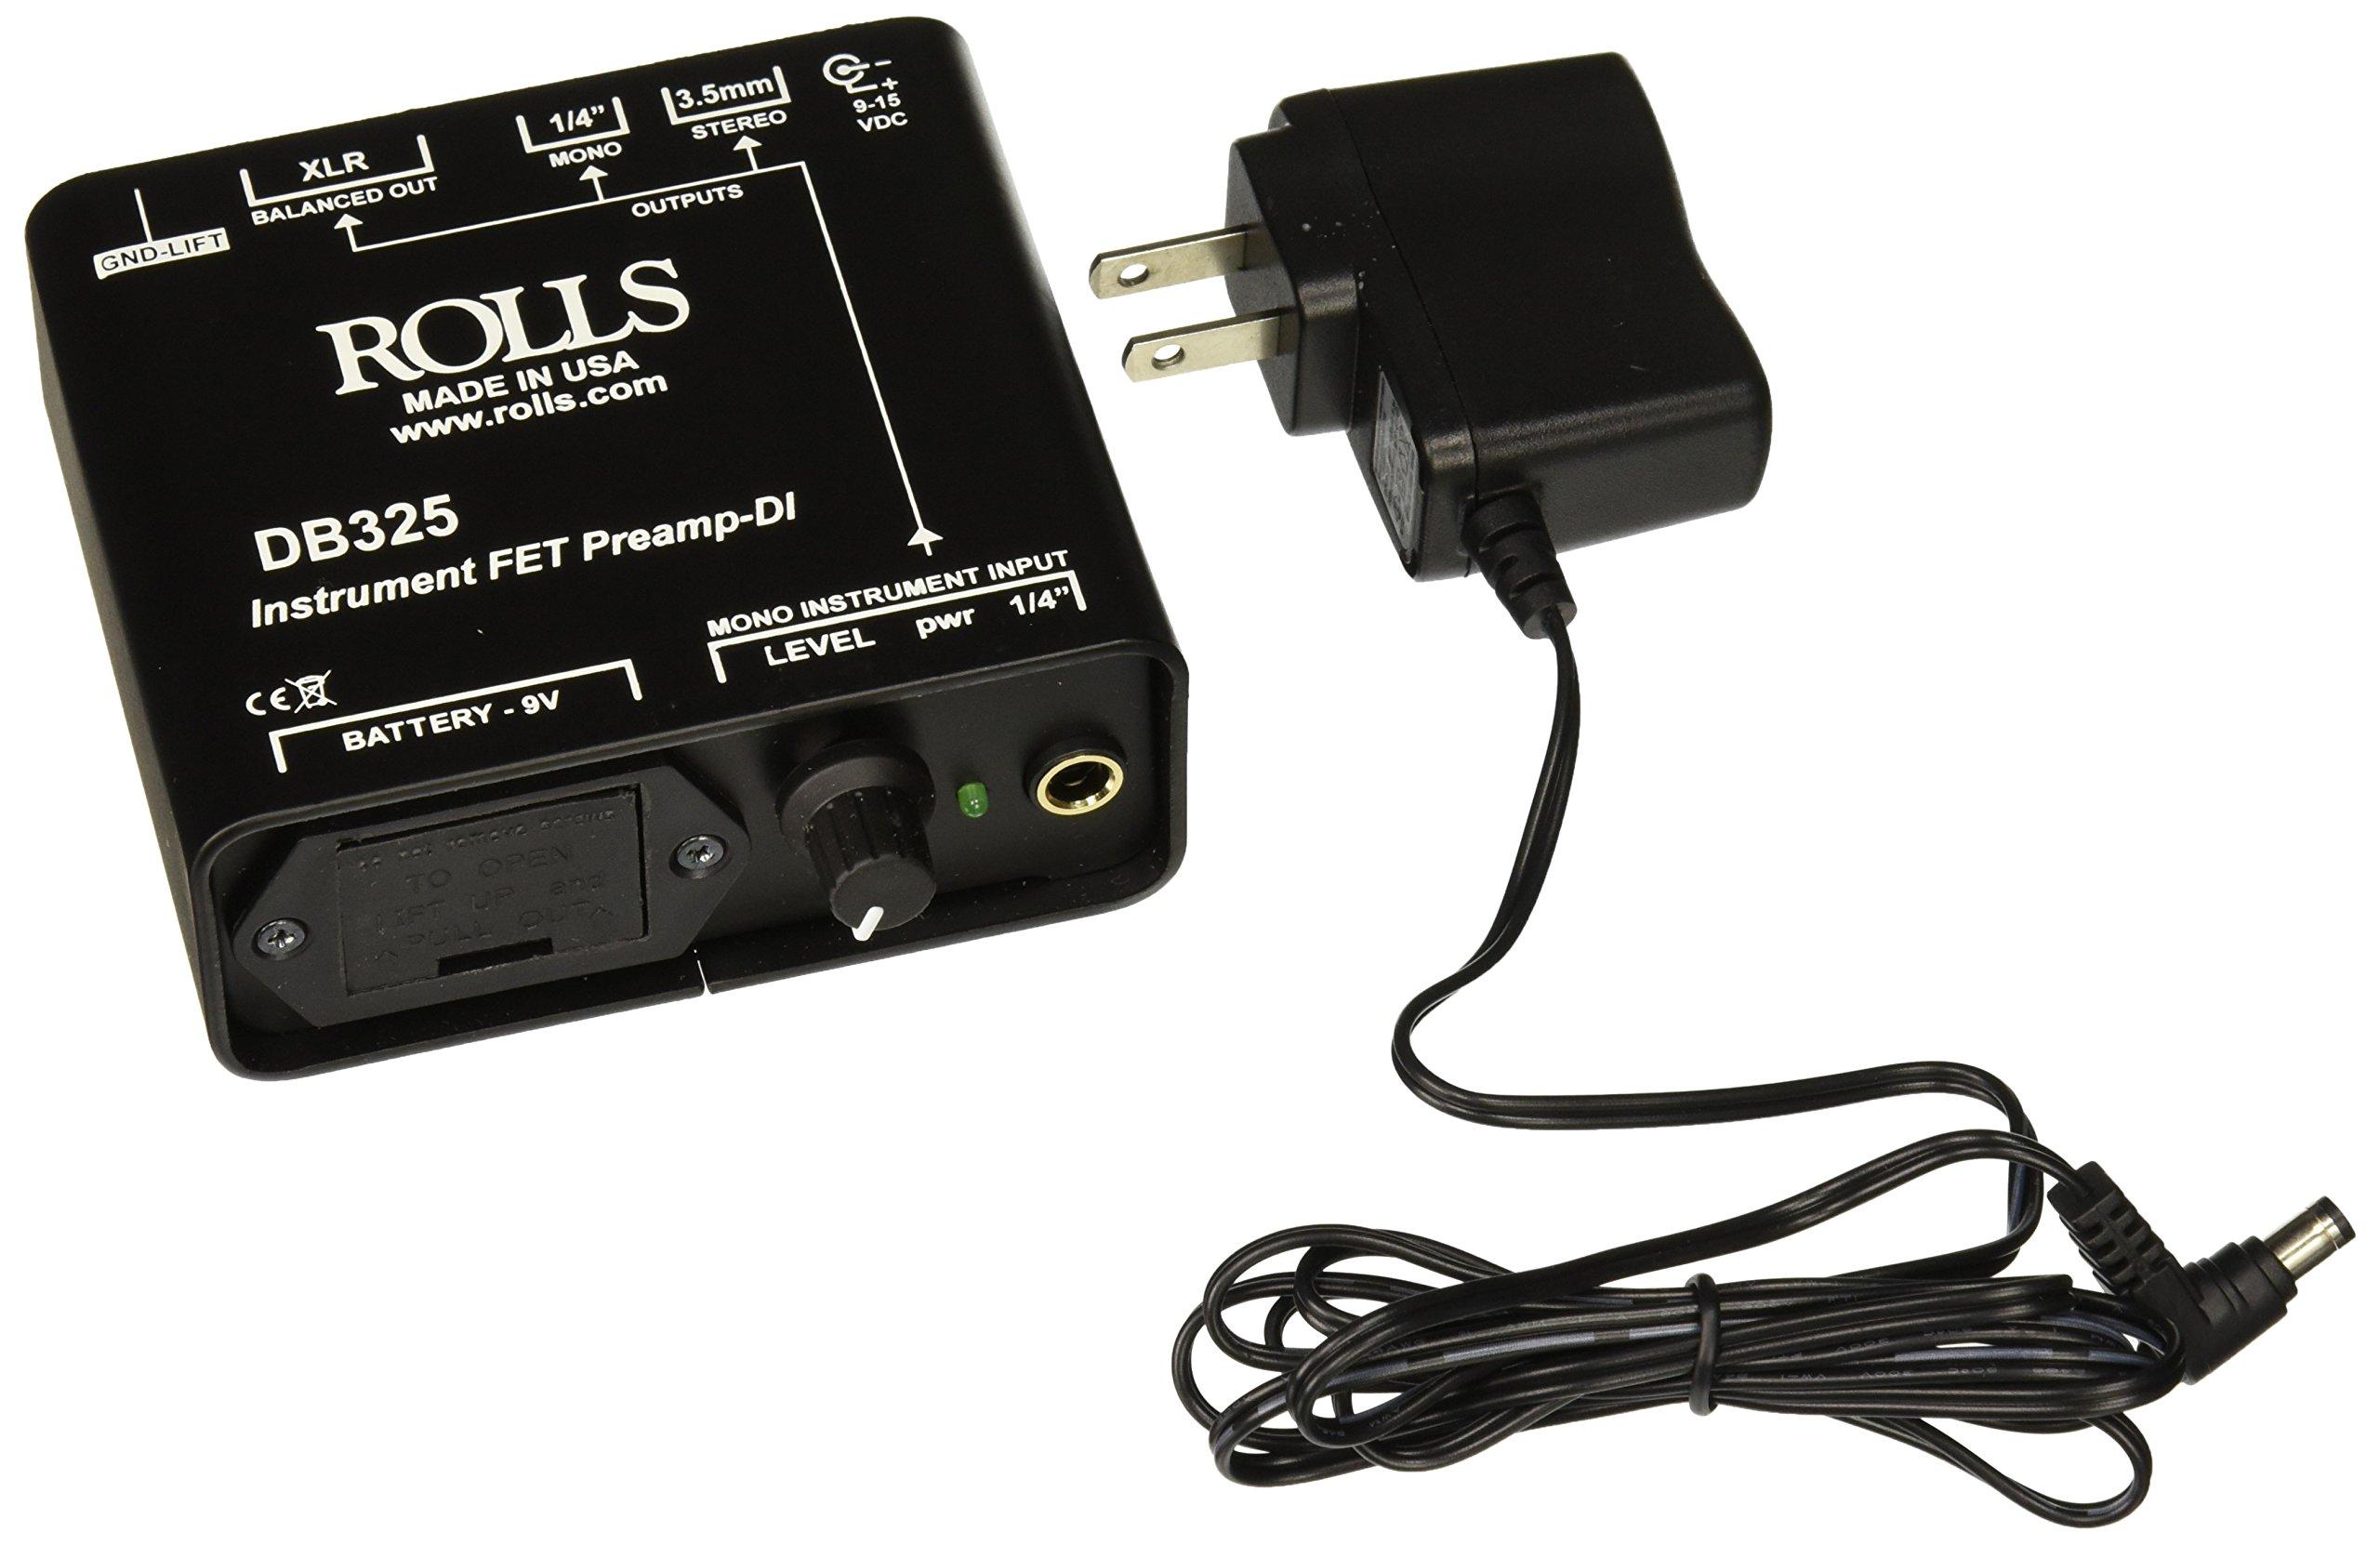 rolls DB325 Instrument Fet Preamp-Di